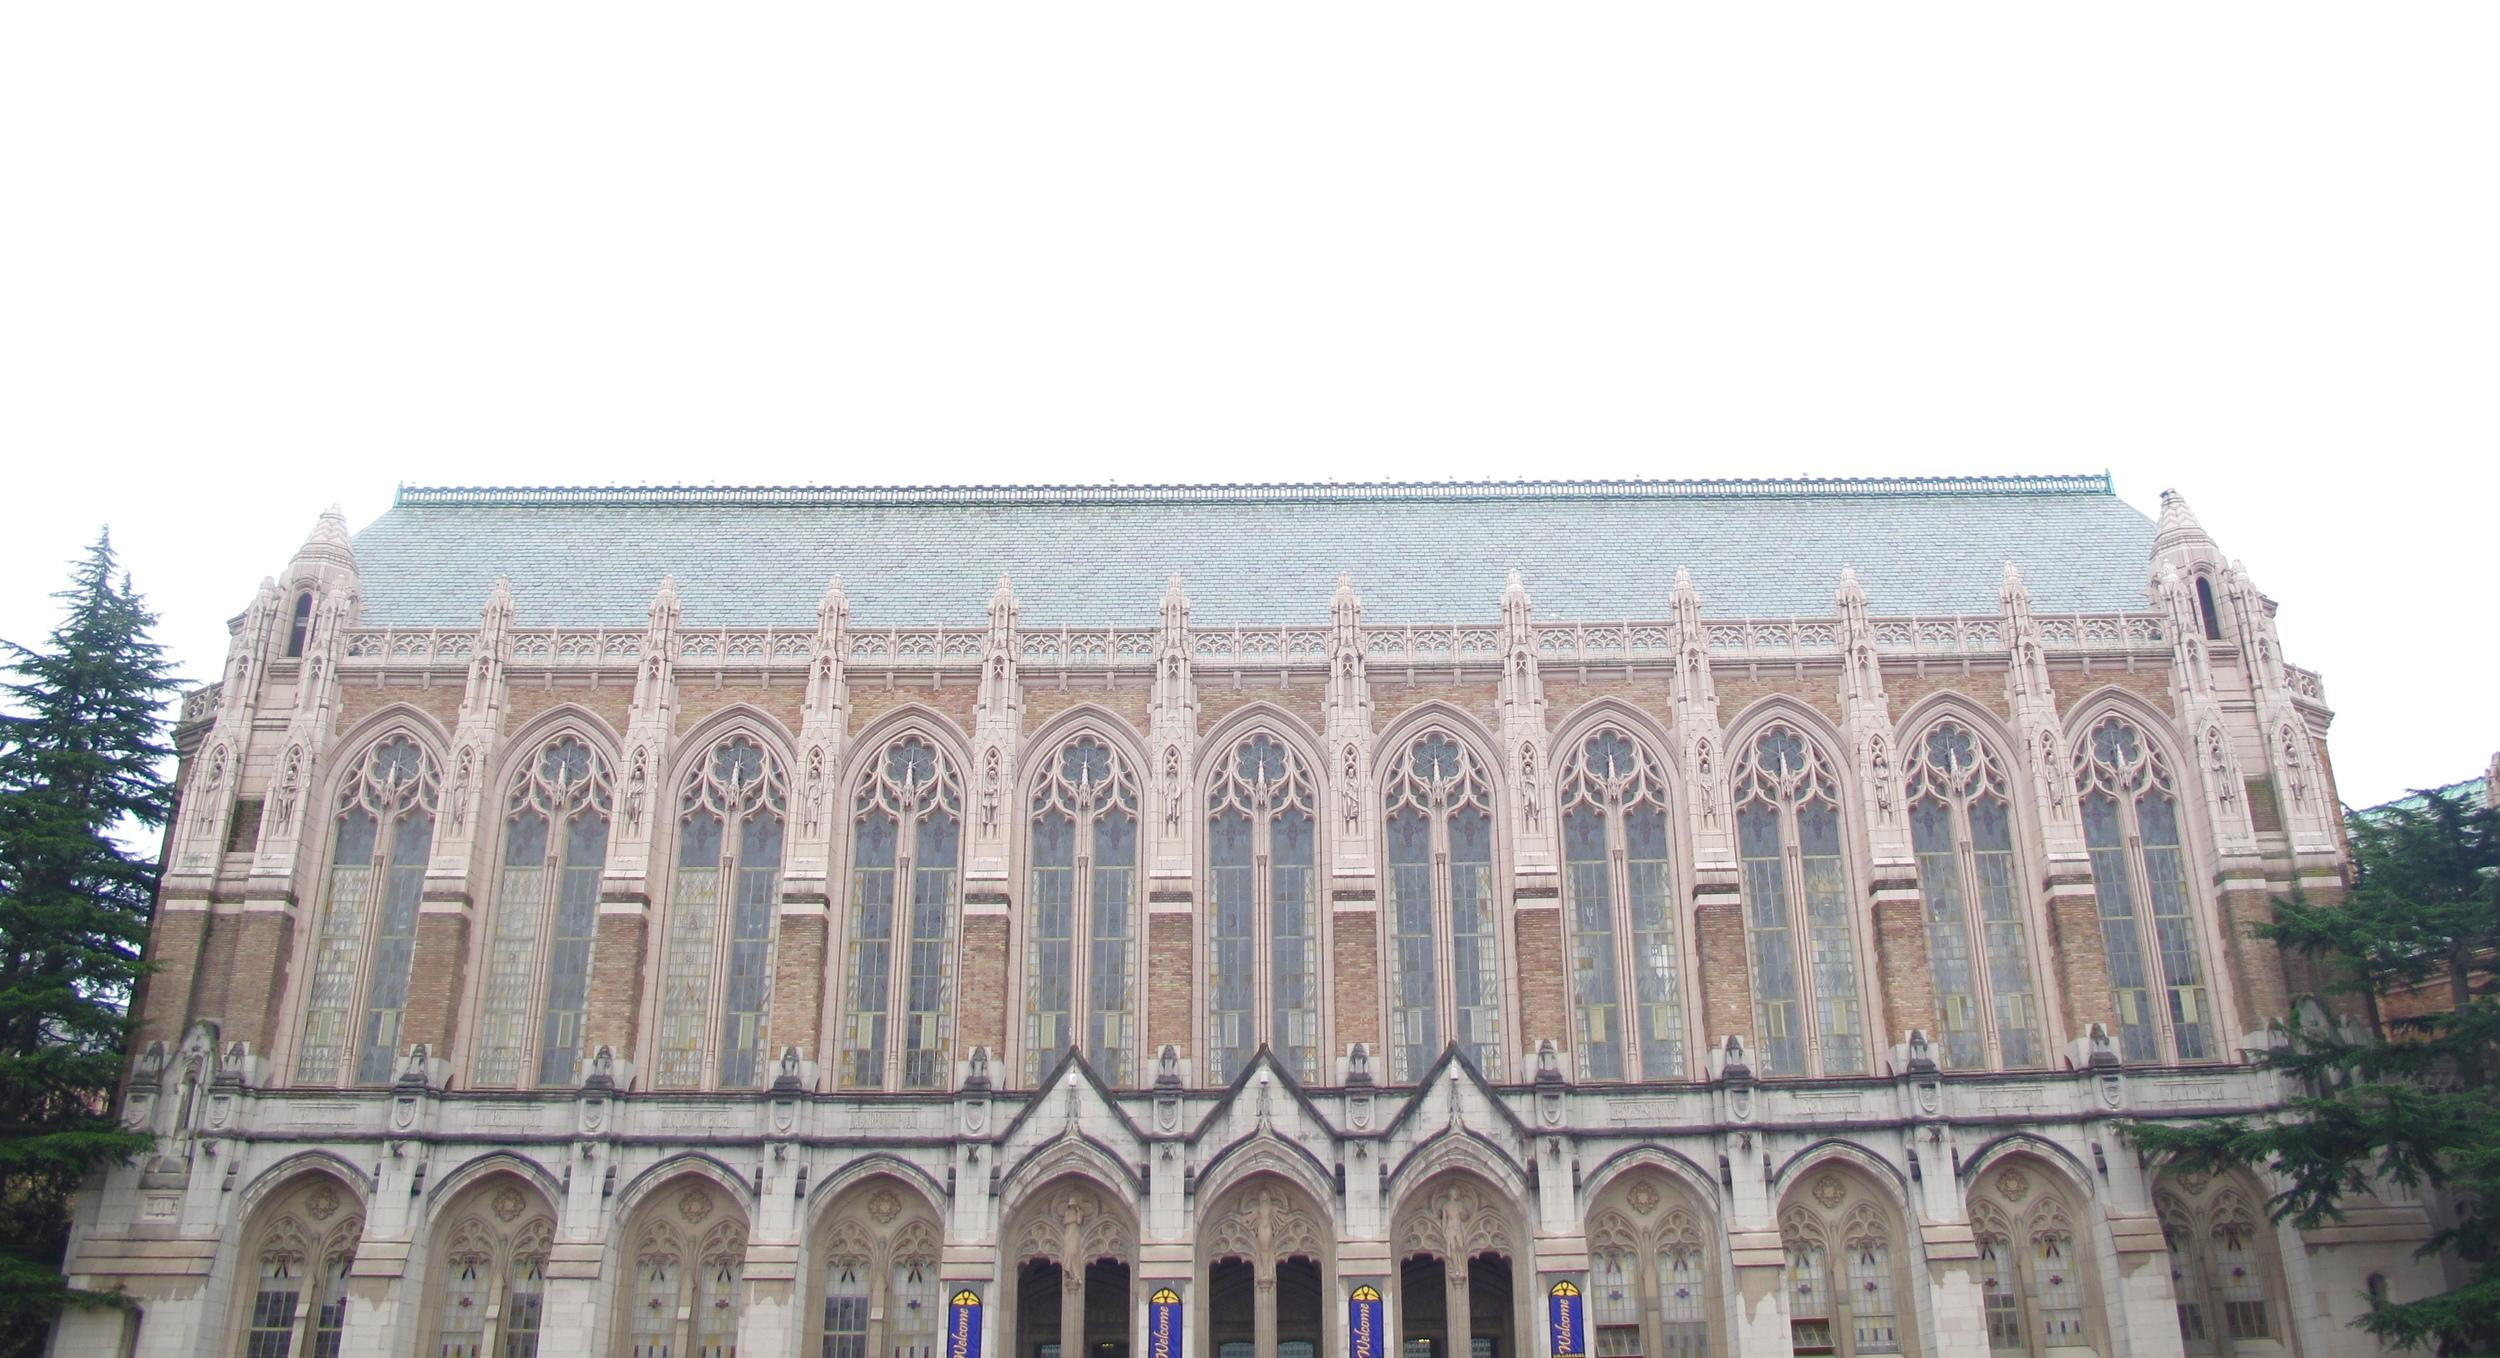 The Reading Room library at the University of Washington.